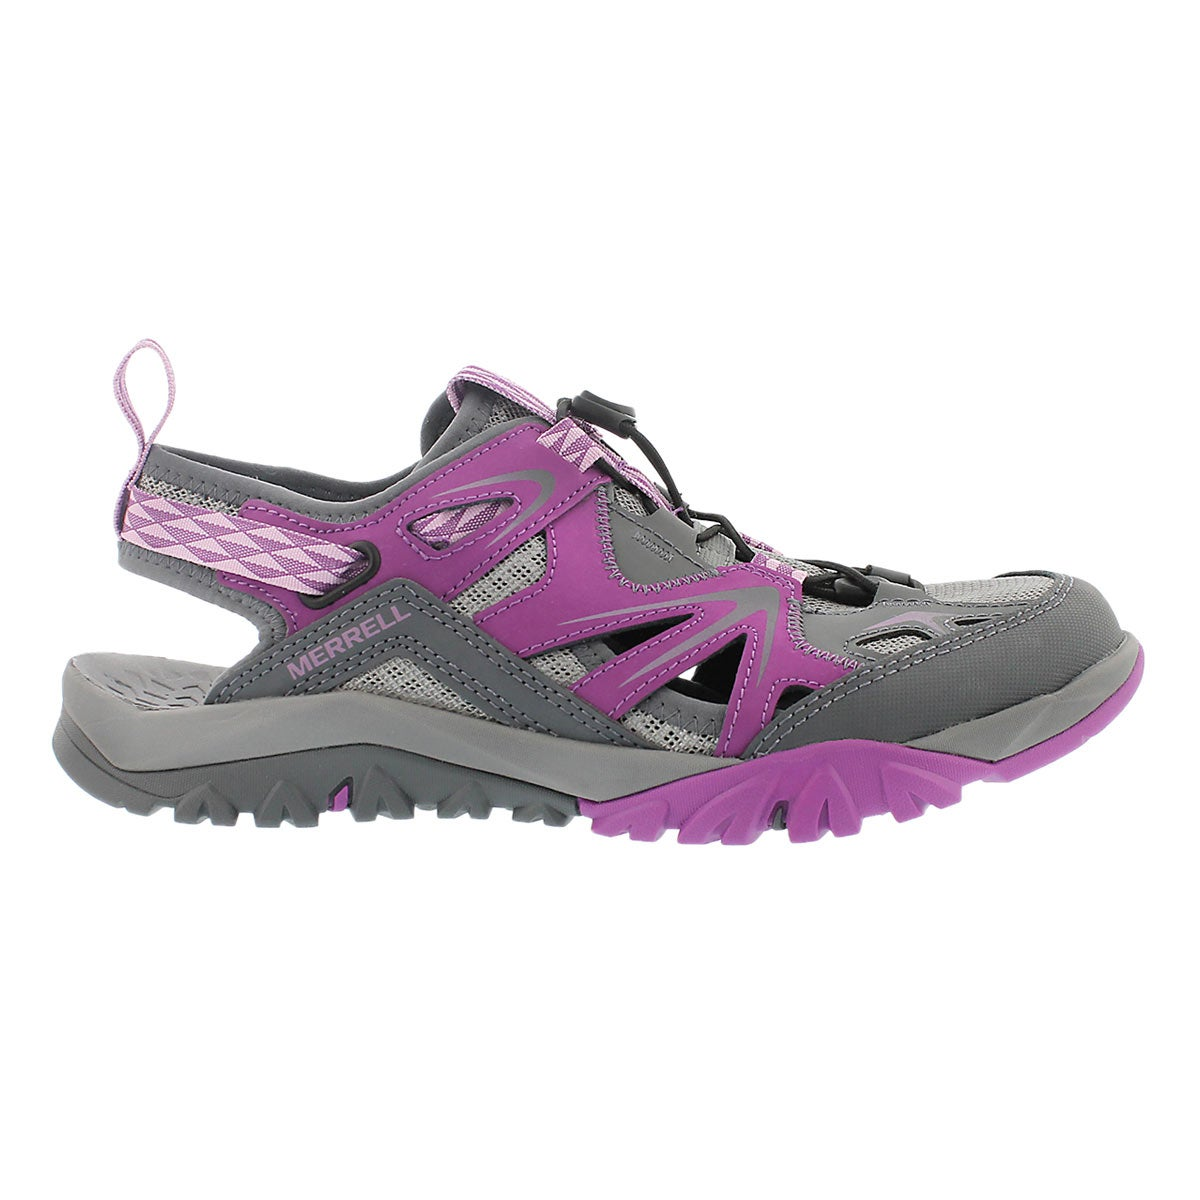 Sandale Capra Rapid, violet/gris, femmes